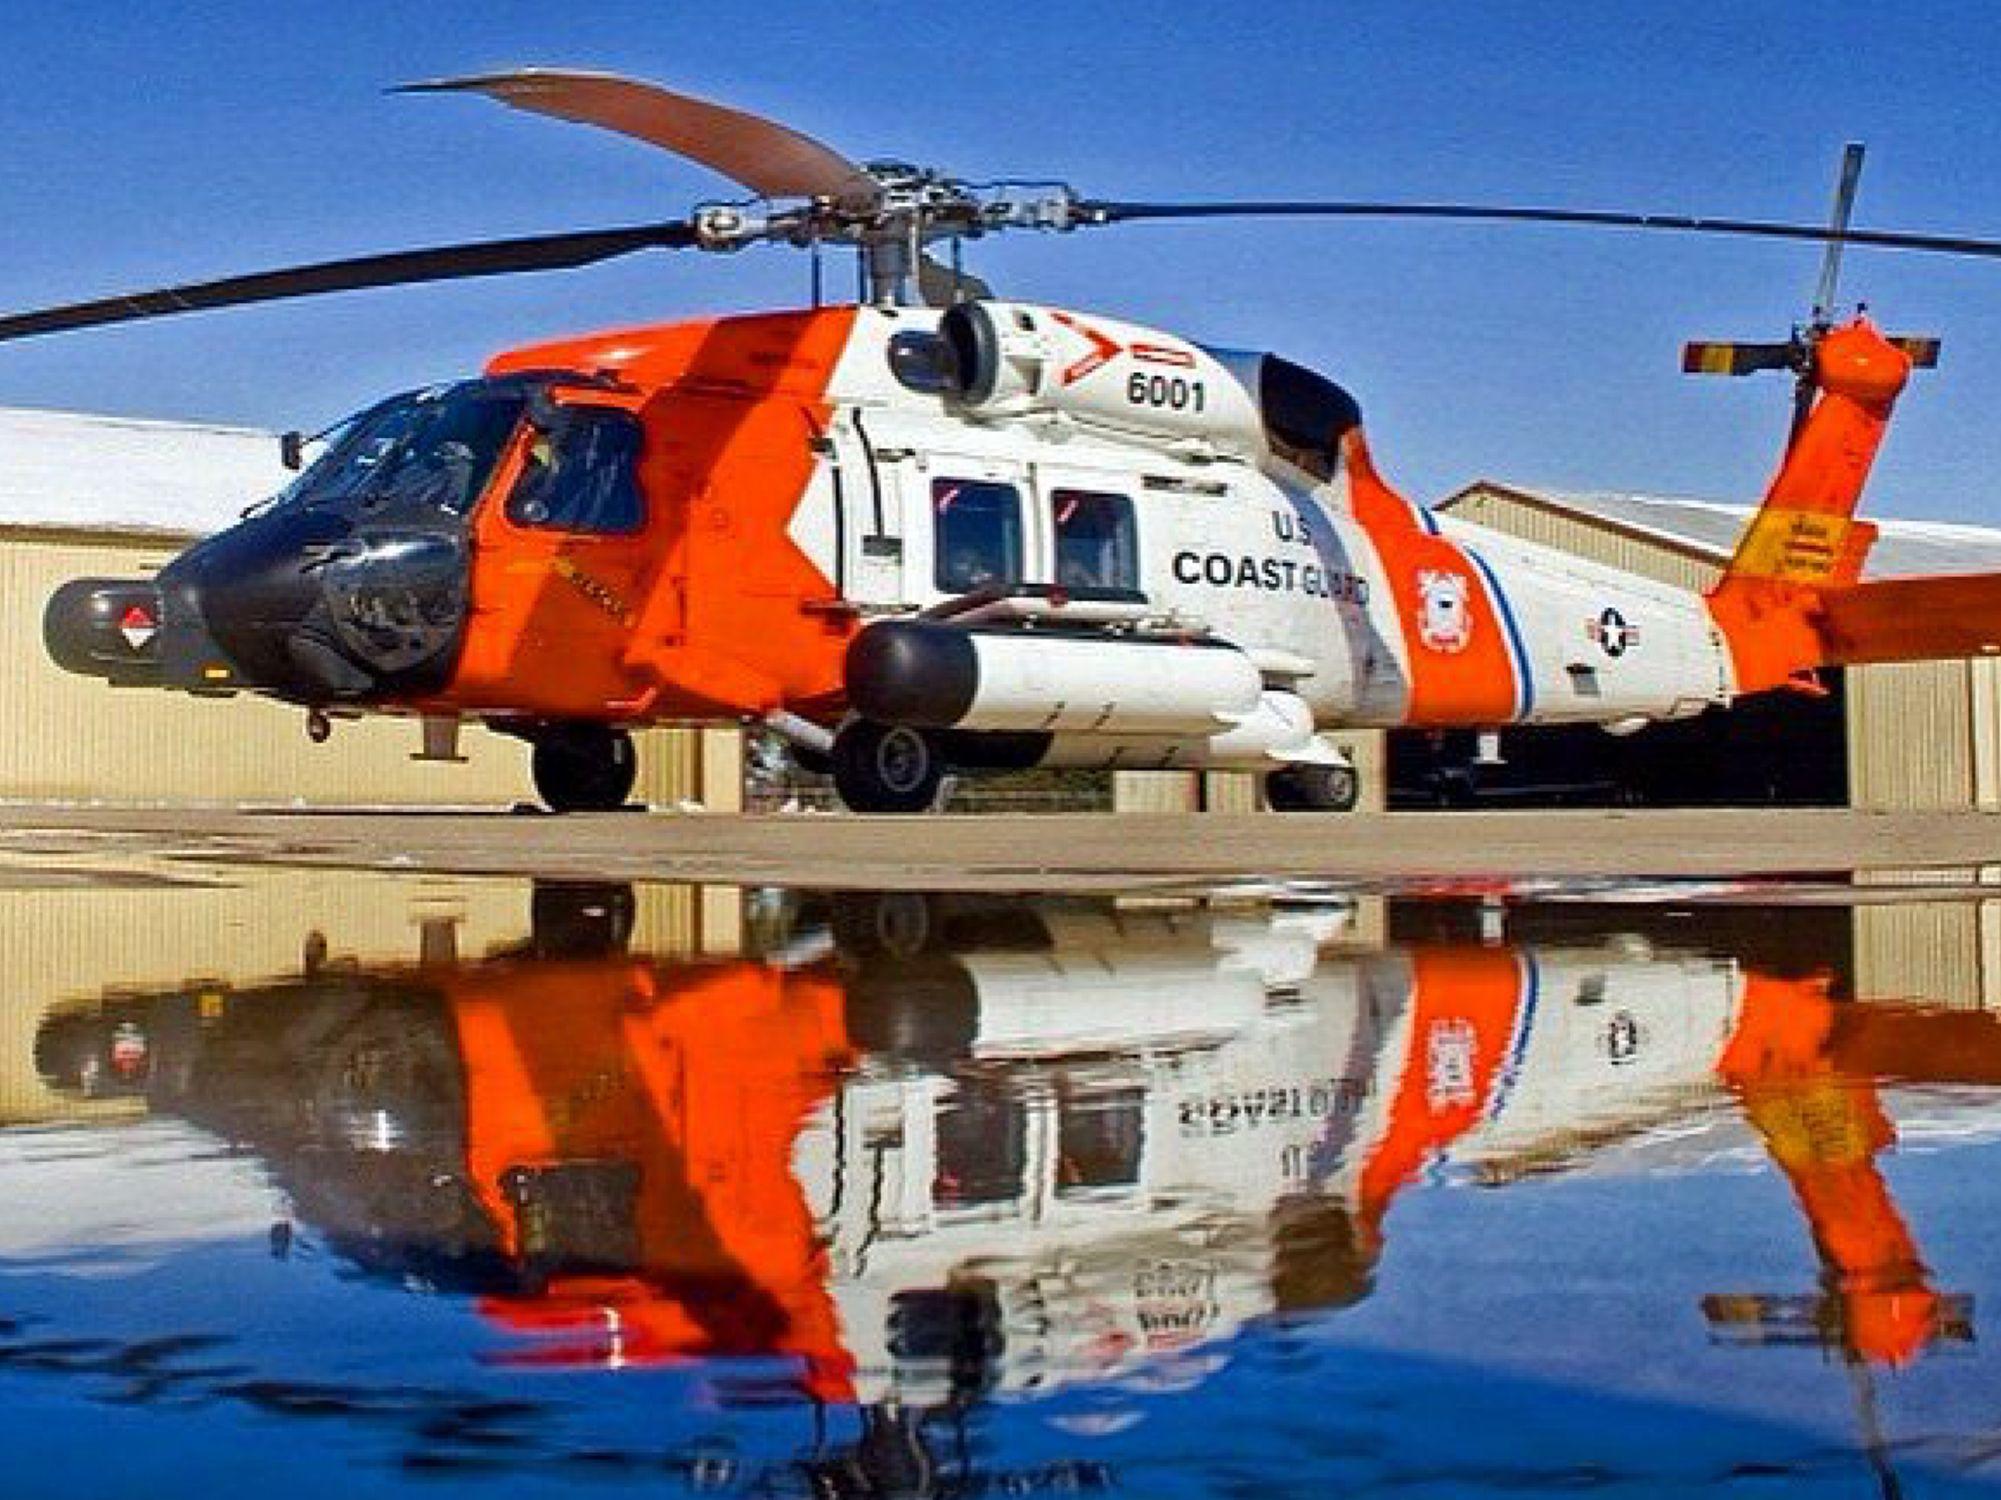 U S Coast Guard 6001 MH-60T Thunderhawk   Coast Guard/Rescue